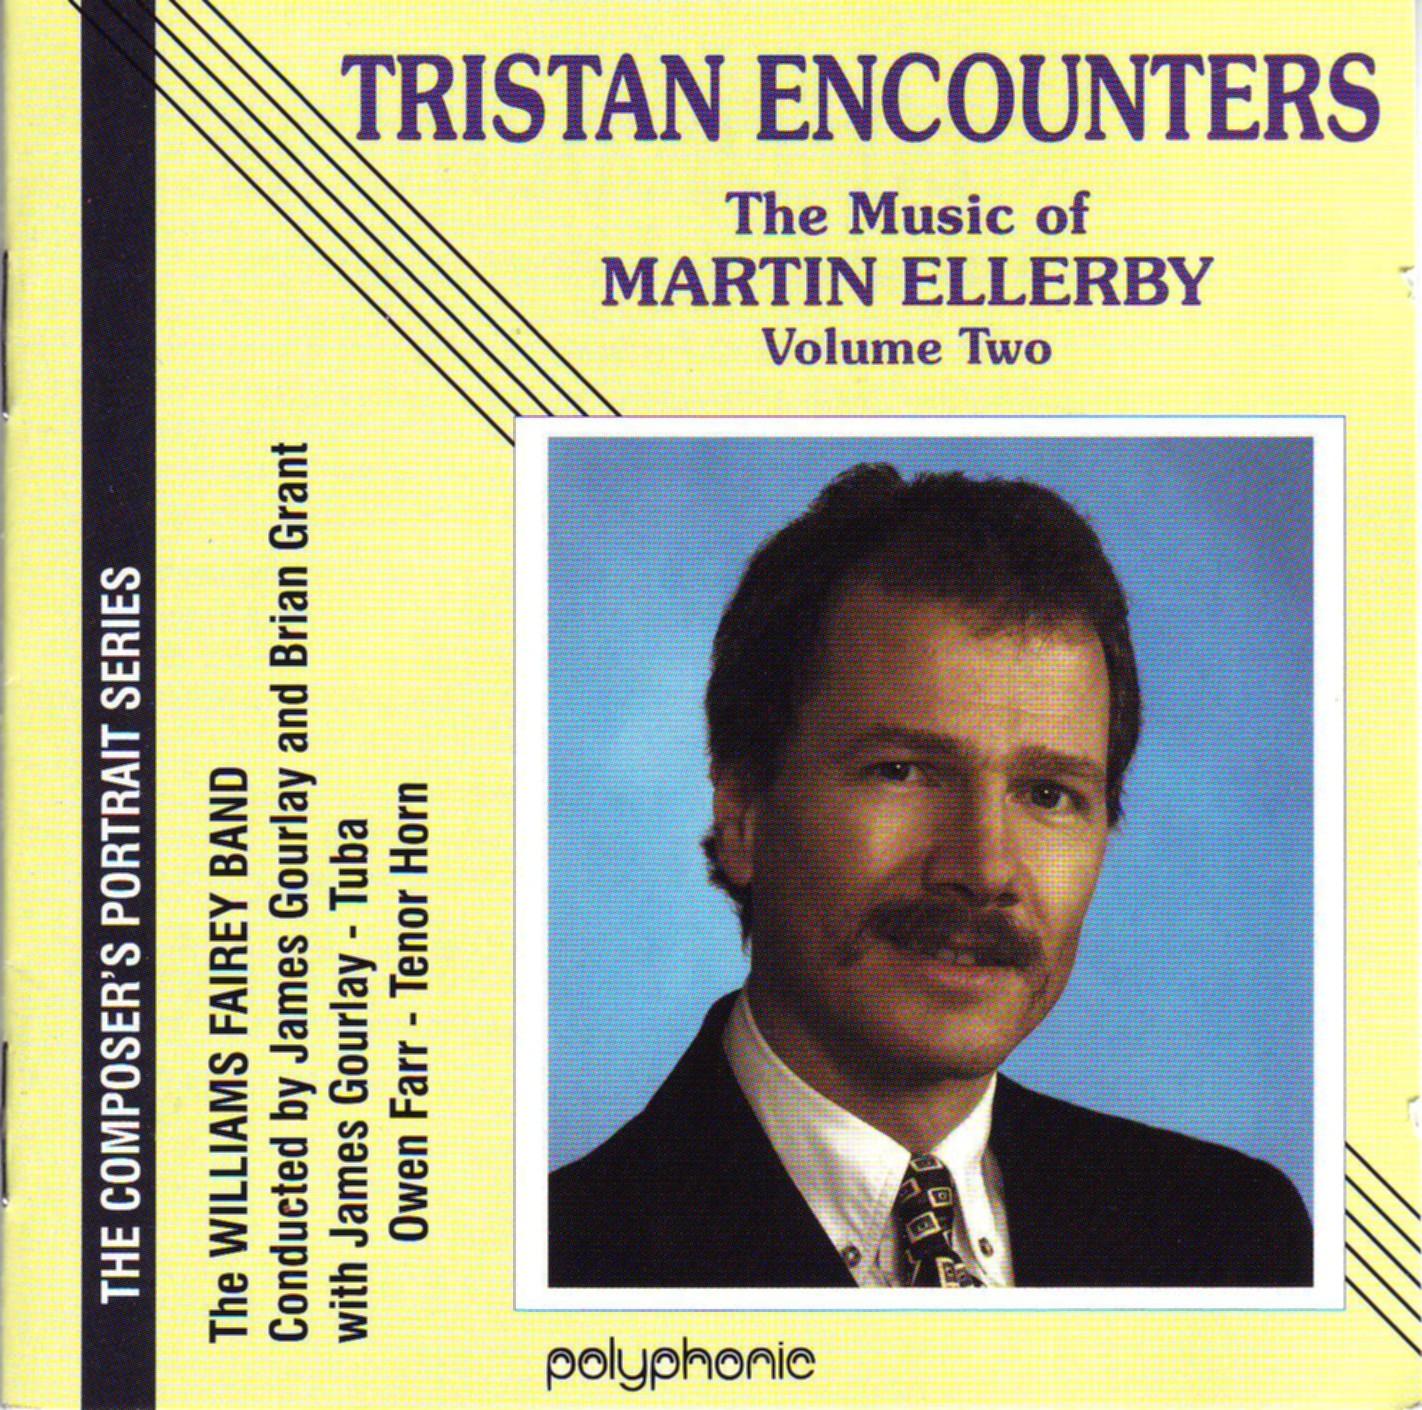 Tristan Encounters